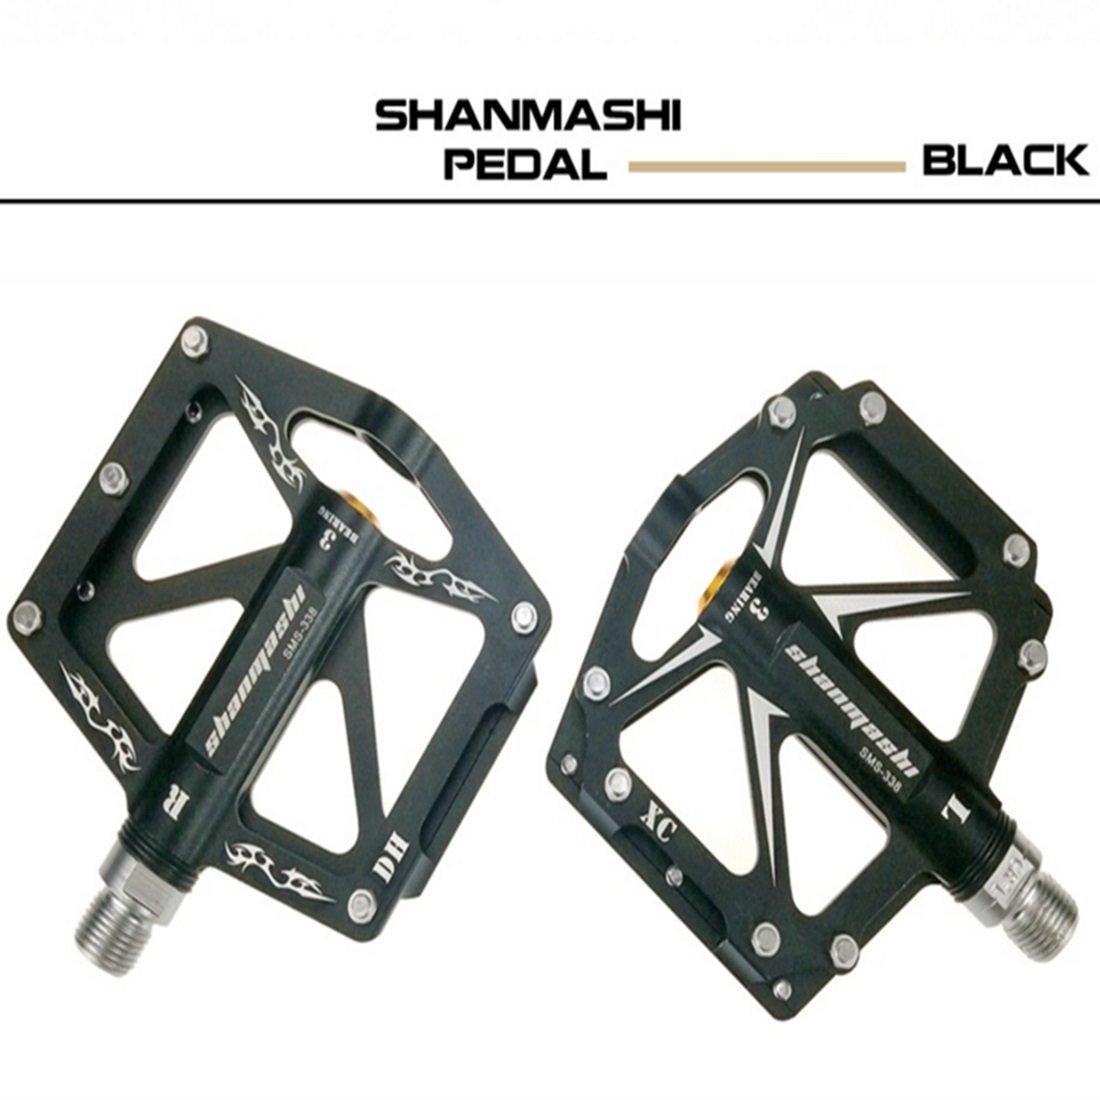 JANFELICIA Doppelseitige DREI-Lager Mountainbike Pedal Aluminiumlegierung Pedal Pedal Road Fixed Gear Fahrrad Pedal